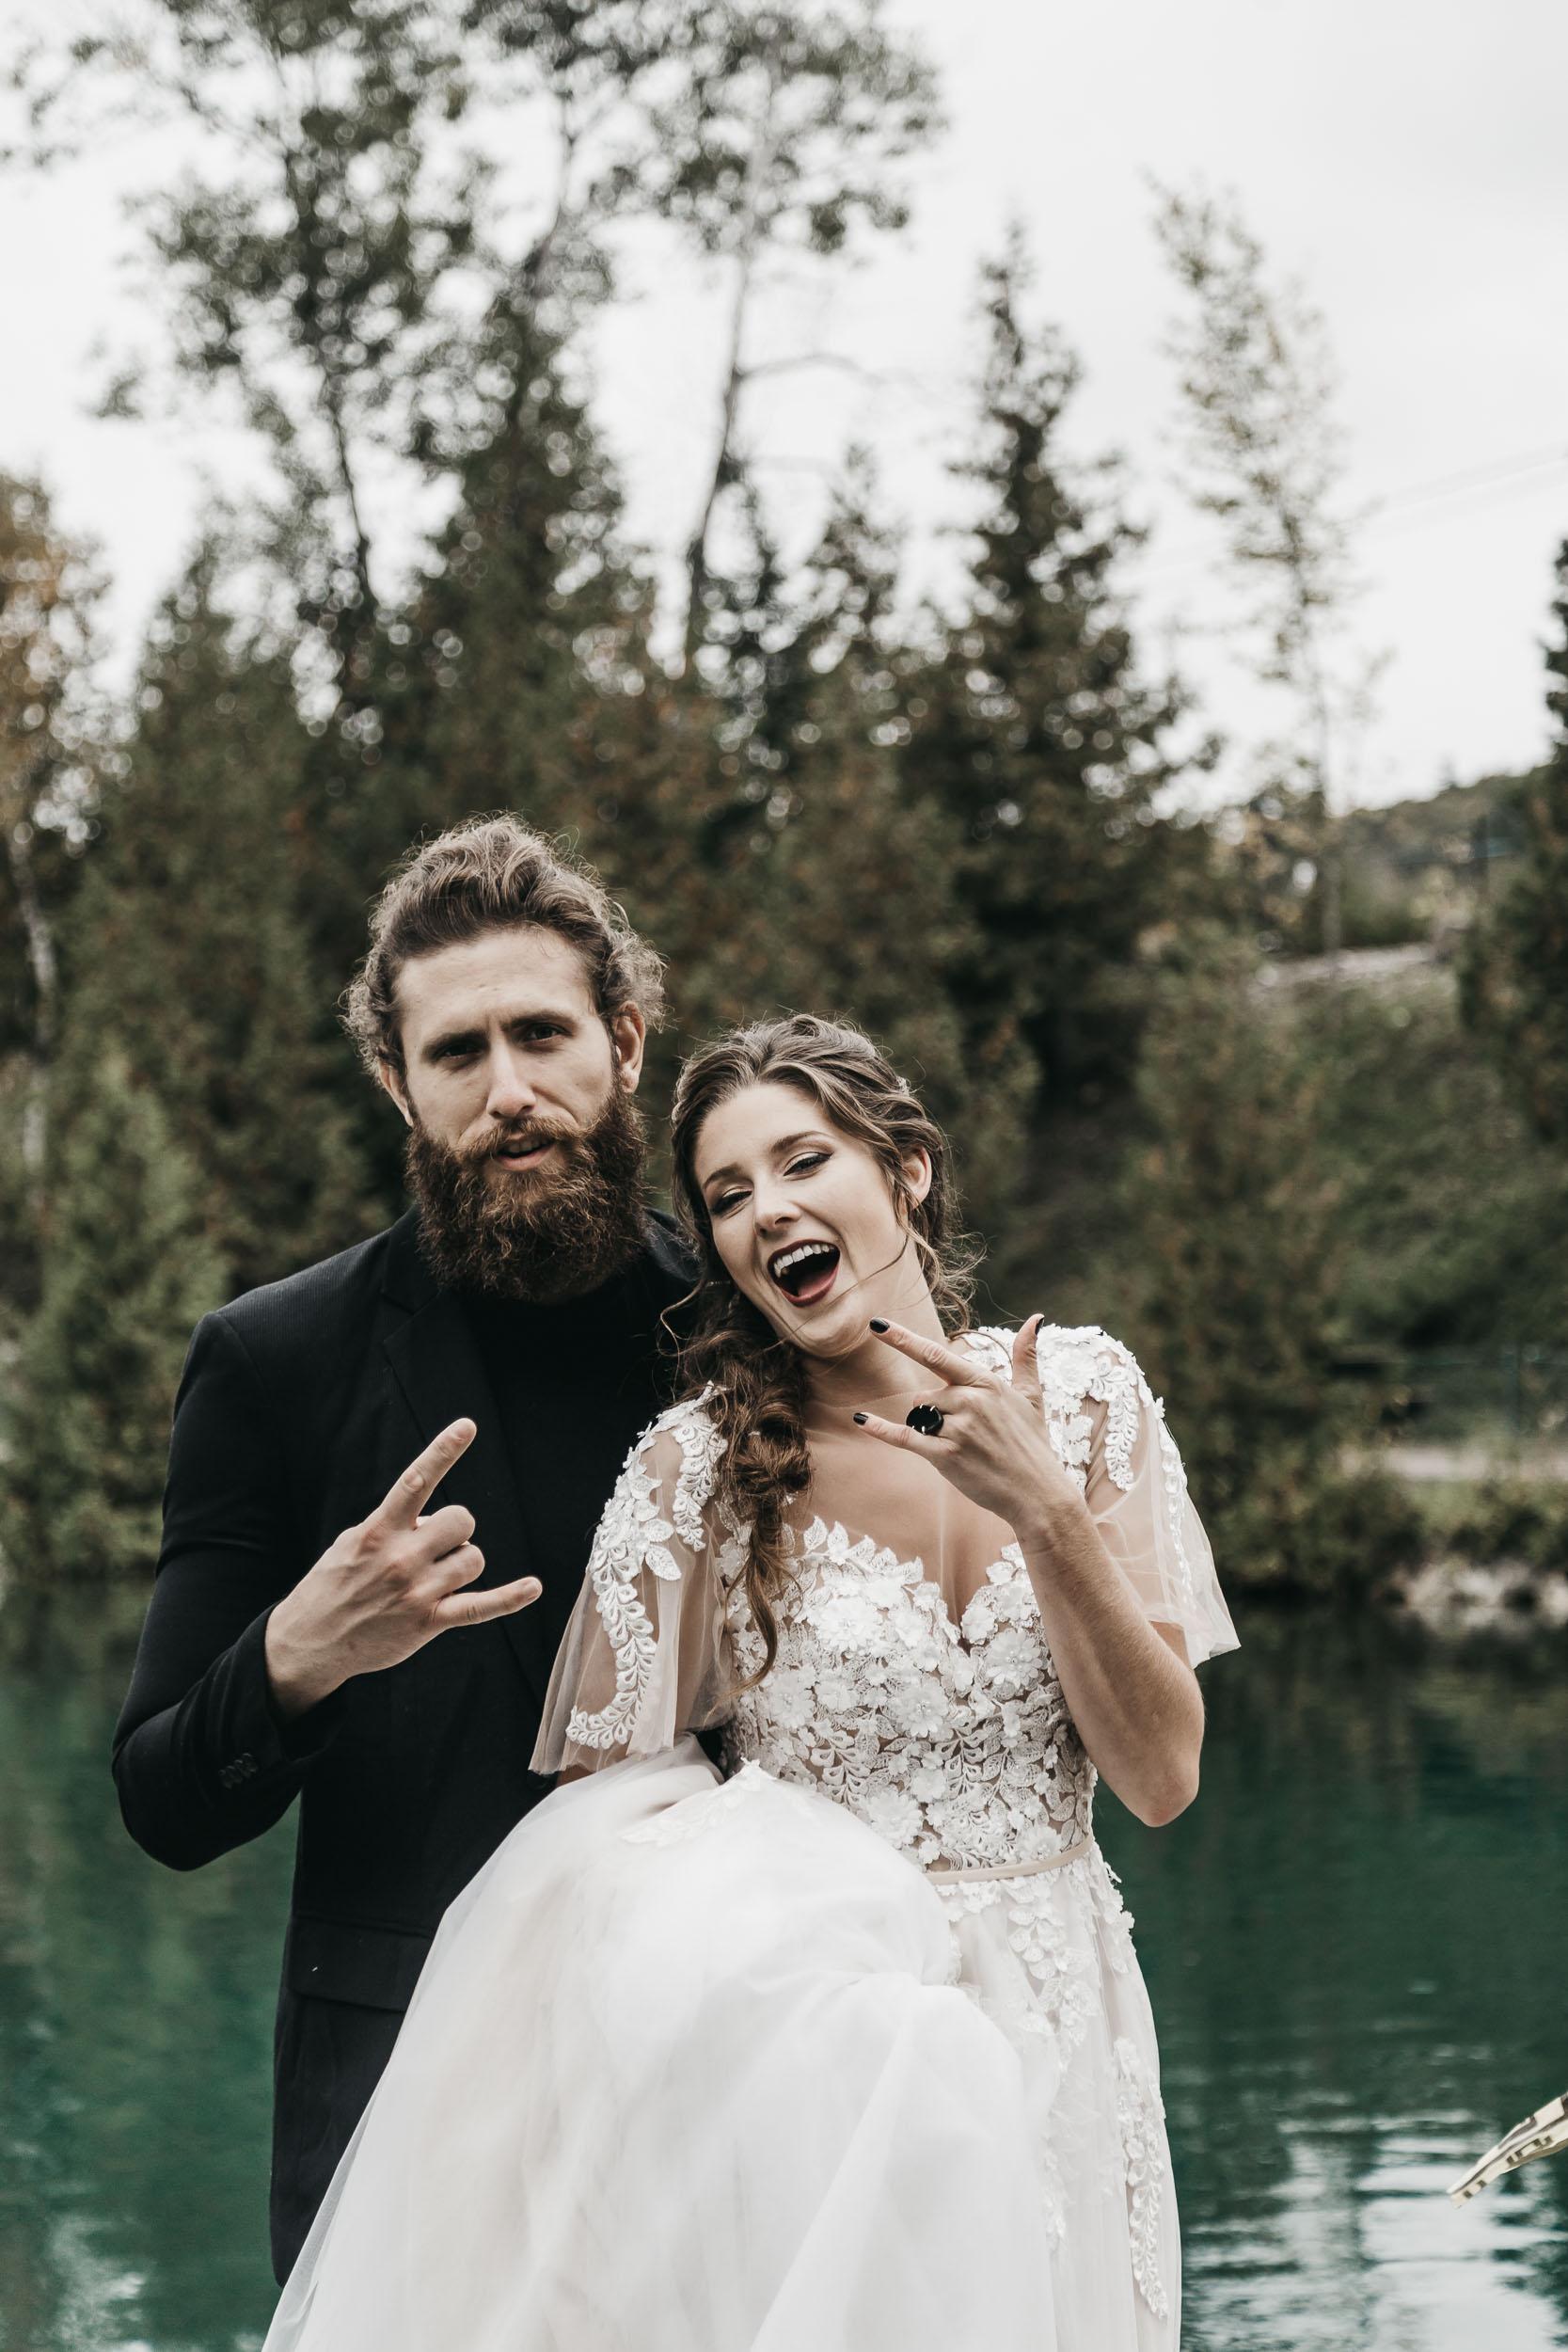 intimate-wedding-elopement-photographer-ottawa-toronto-0395.jpg